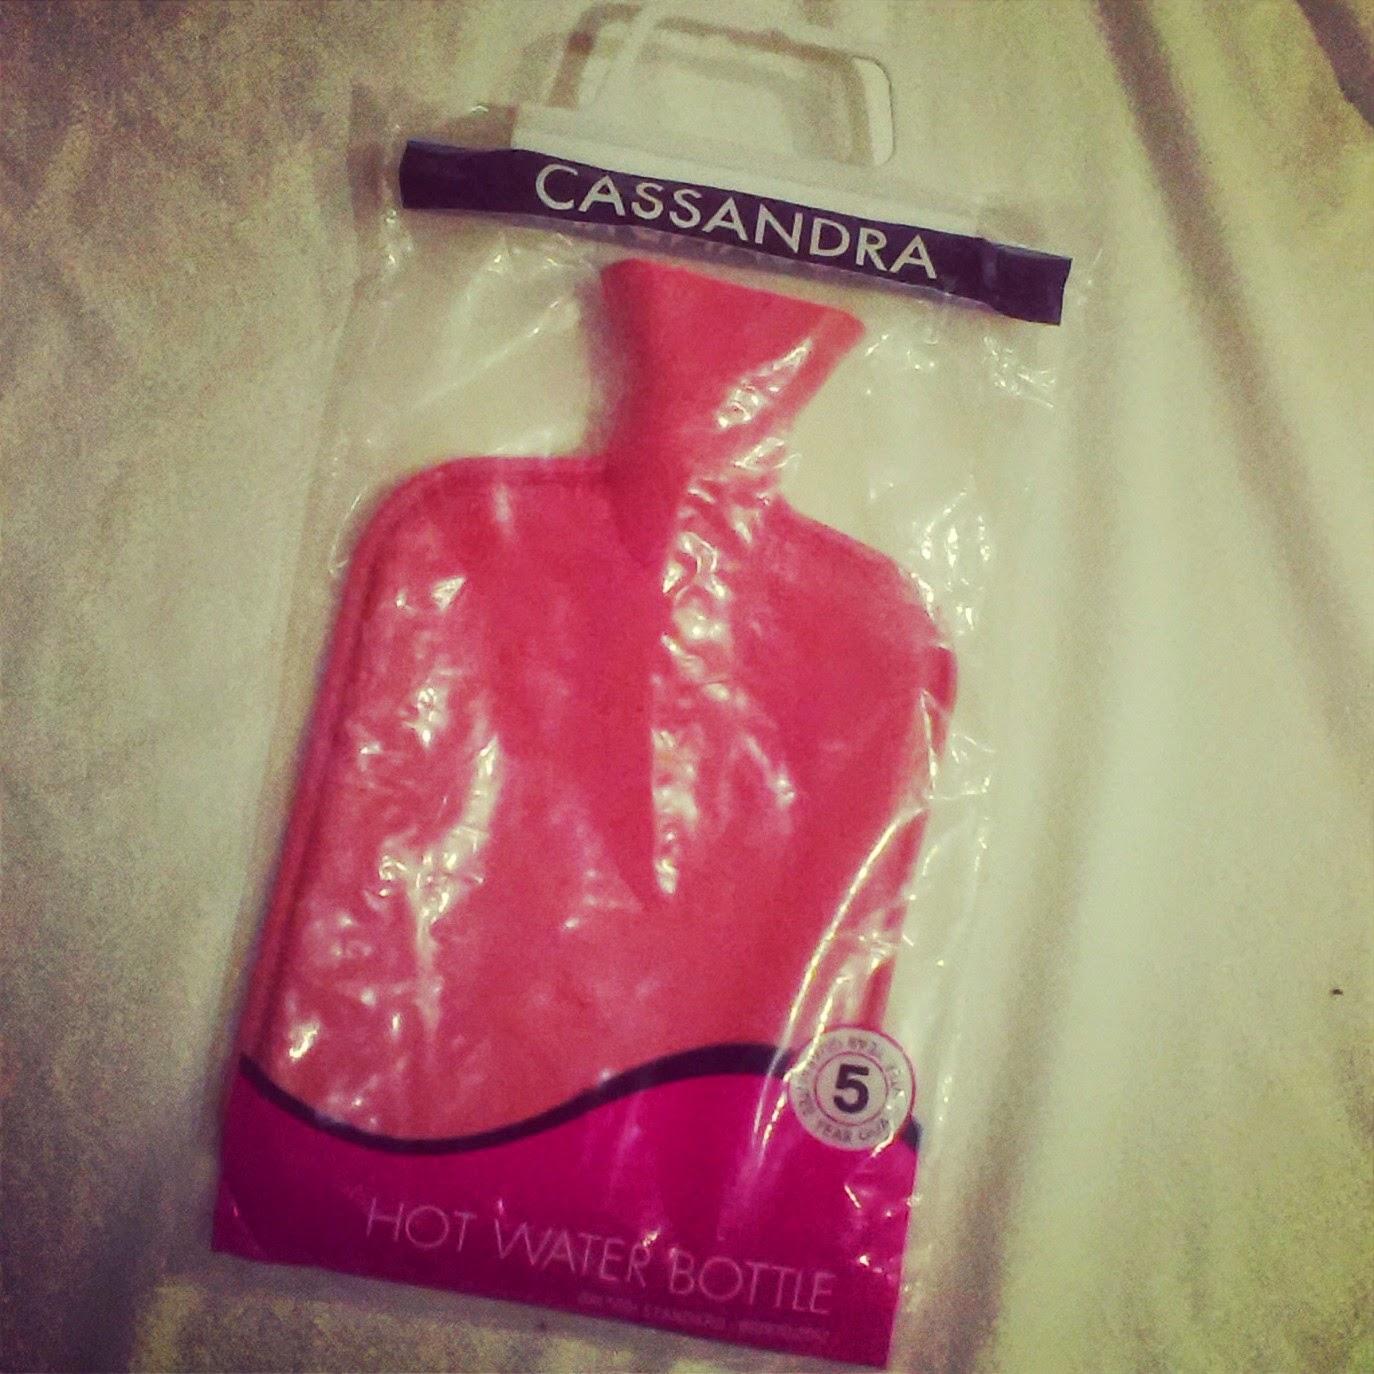 Cassandra the Hot Water Bottle